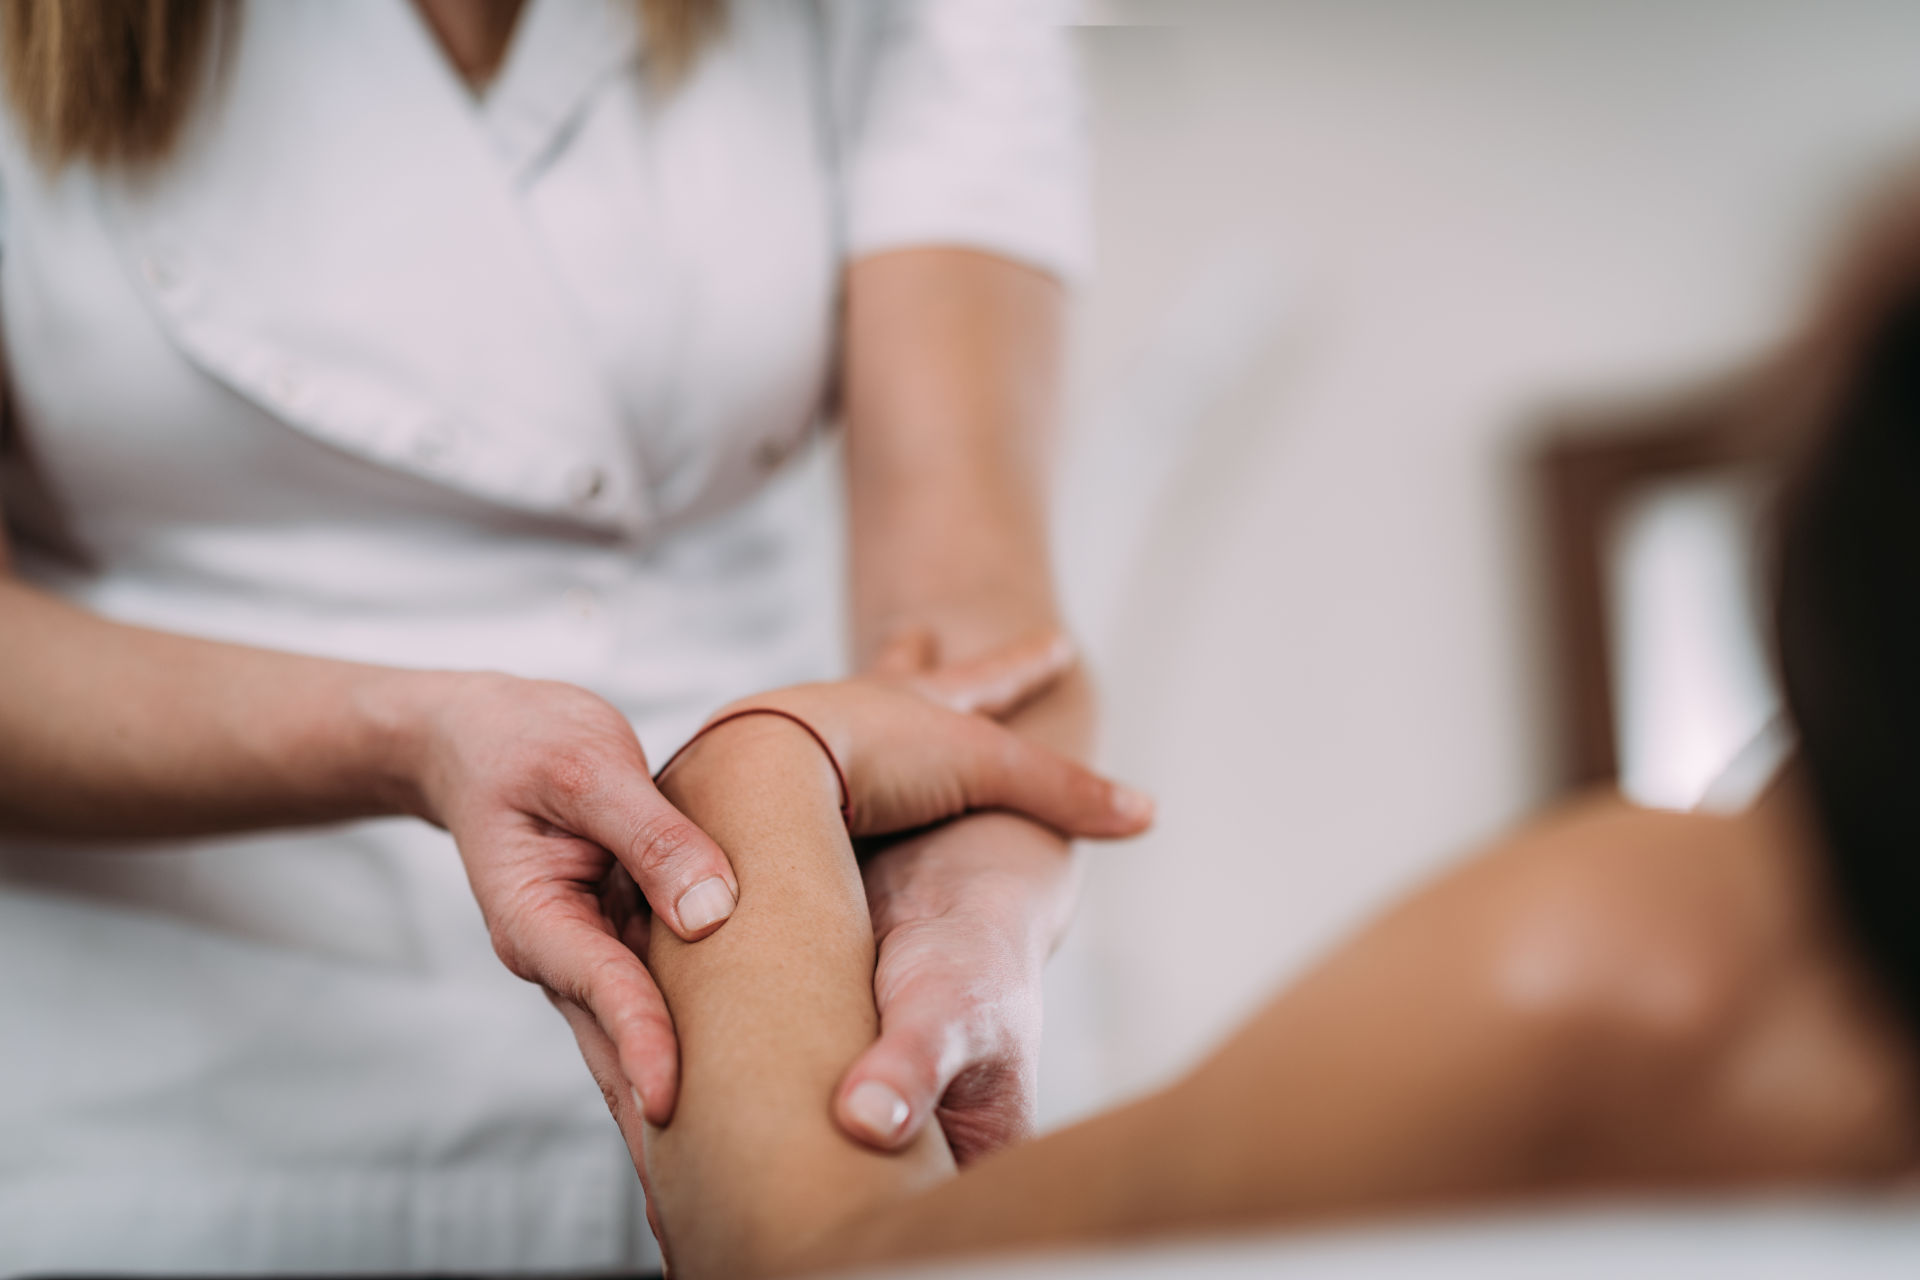 alternatív mozgásterápiák, alternatív ingerterápiák, aktív mozgásterápia, Bowen technika